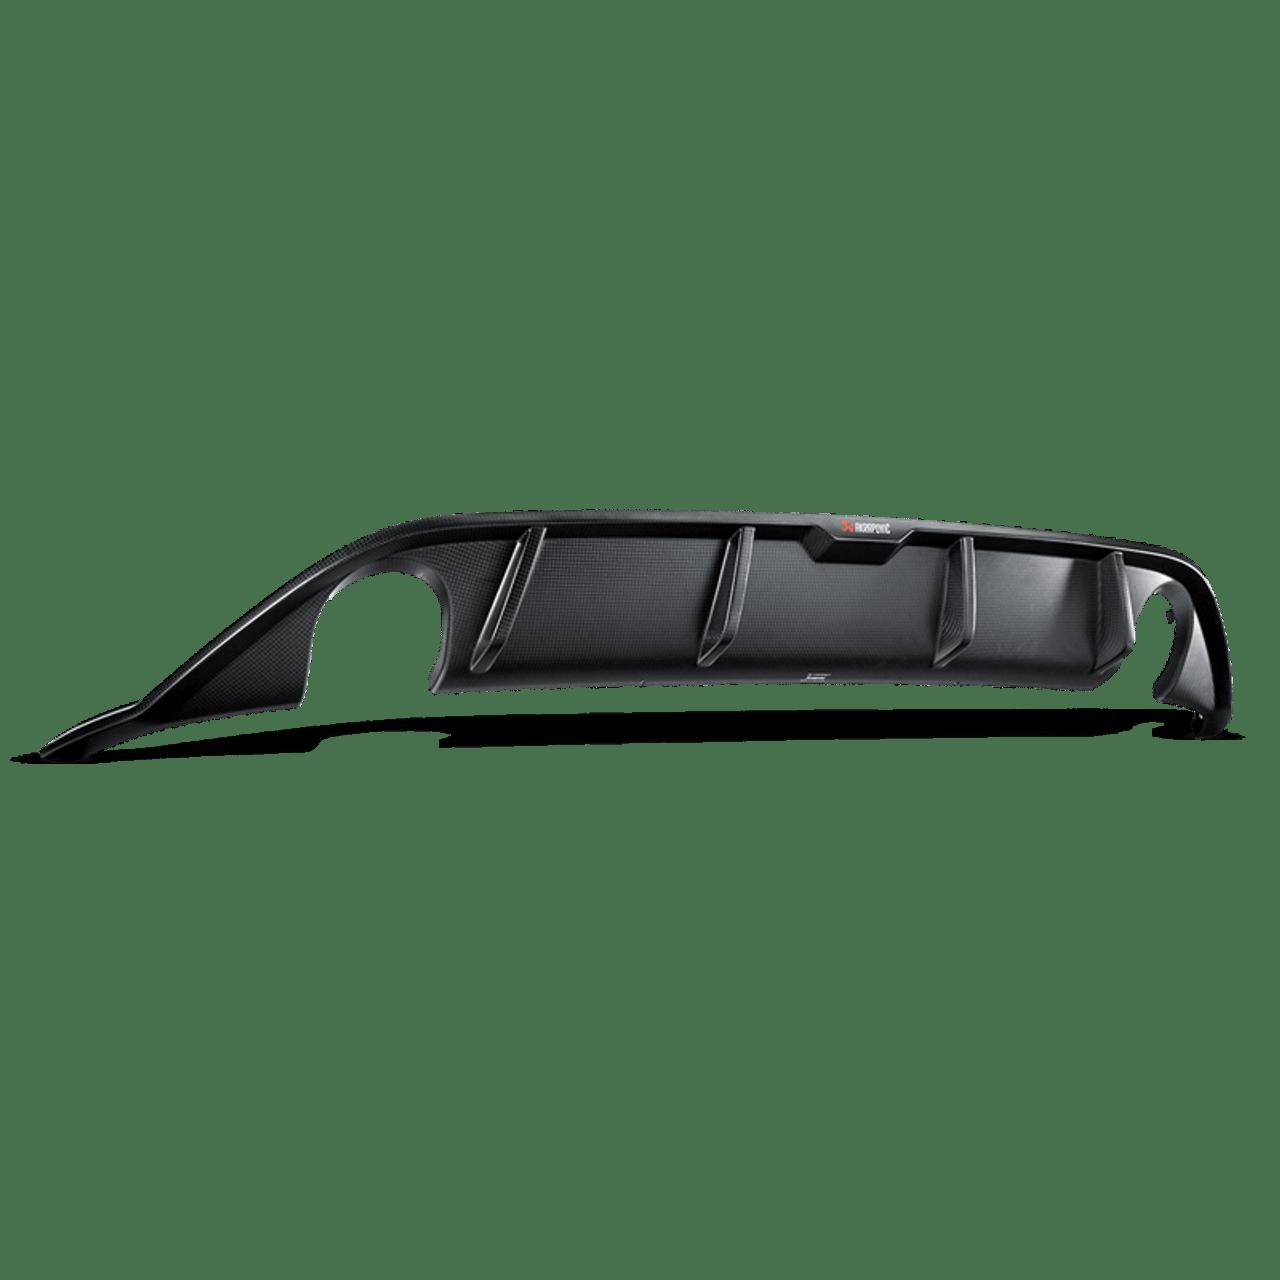 Akrapovic Carbon Rear Diffuser - VW Golf Mk7 GTI